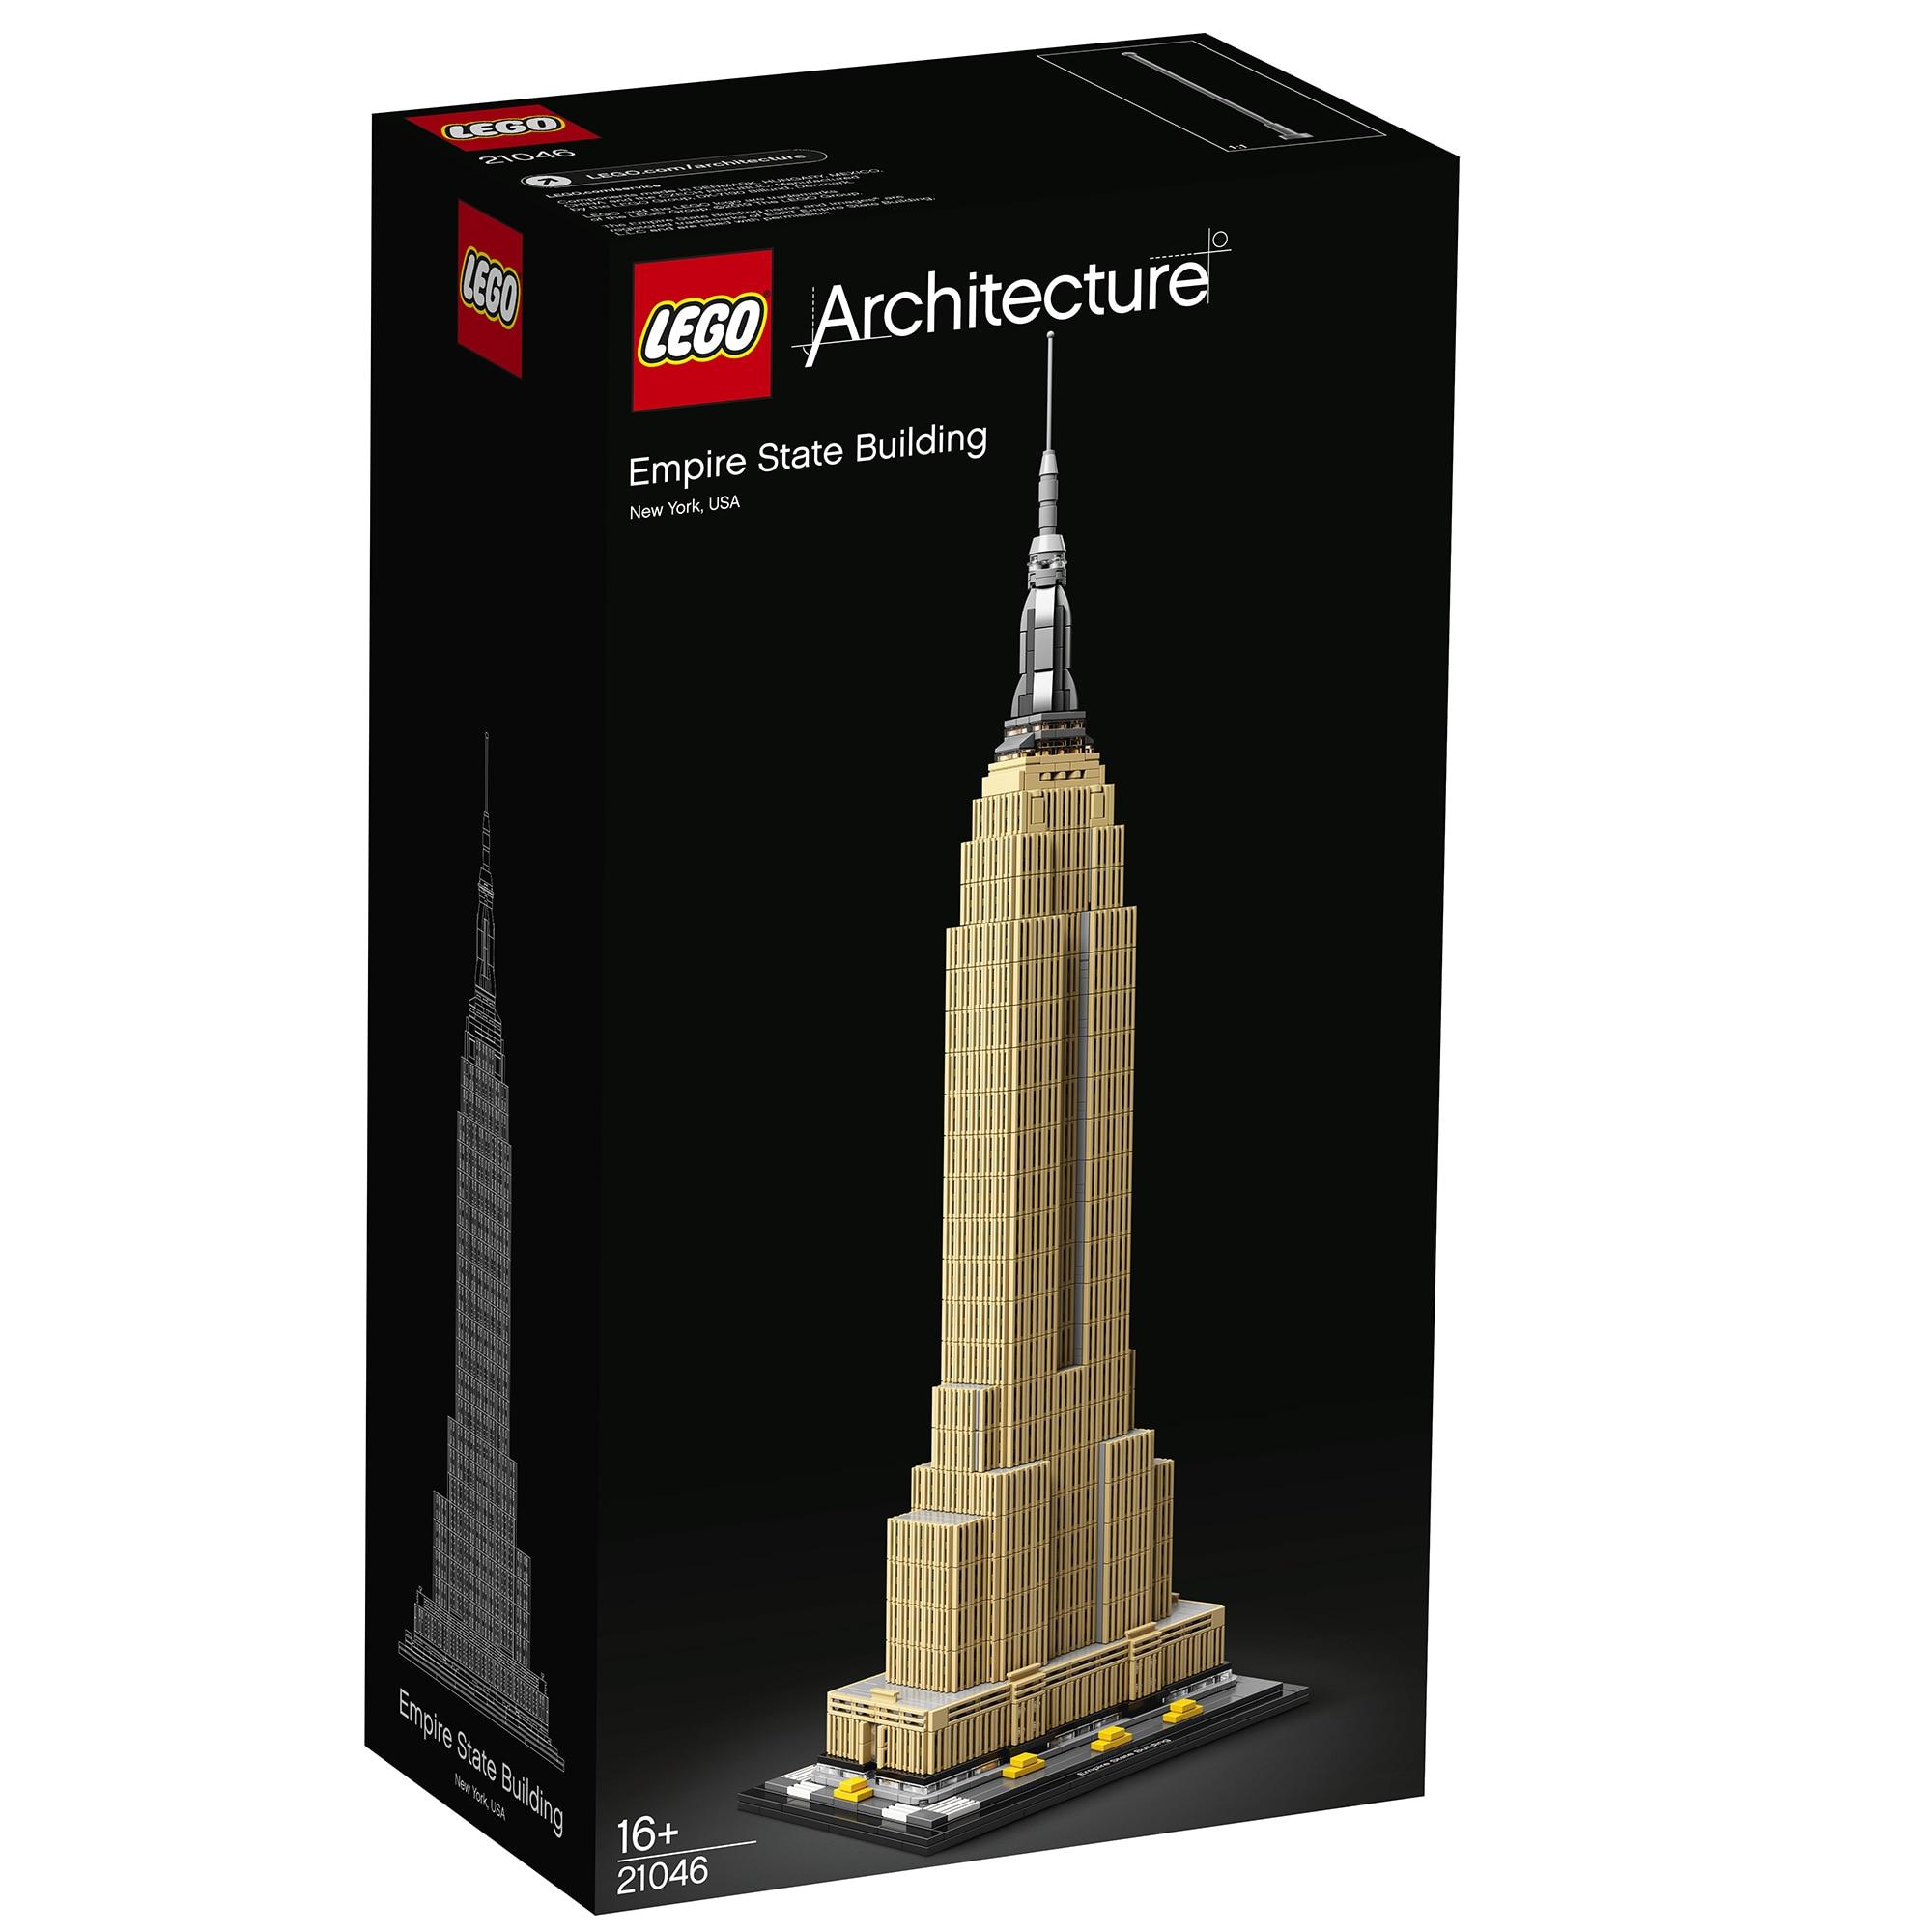 Fotografie LEGO Architecture - Empire State Building 21046, 1767 piese